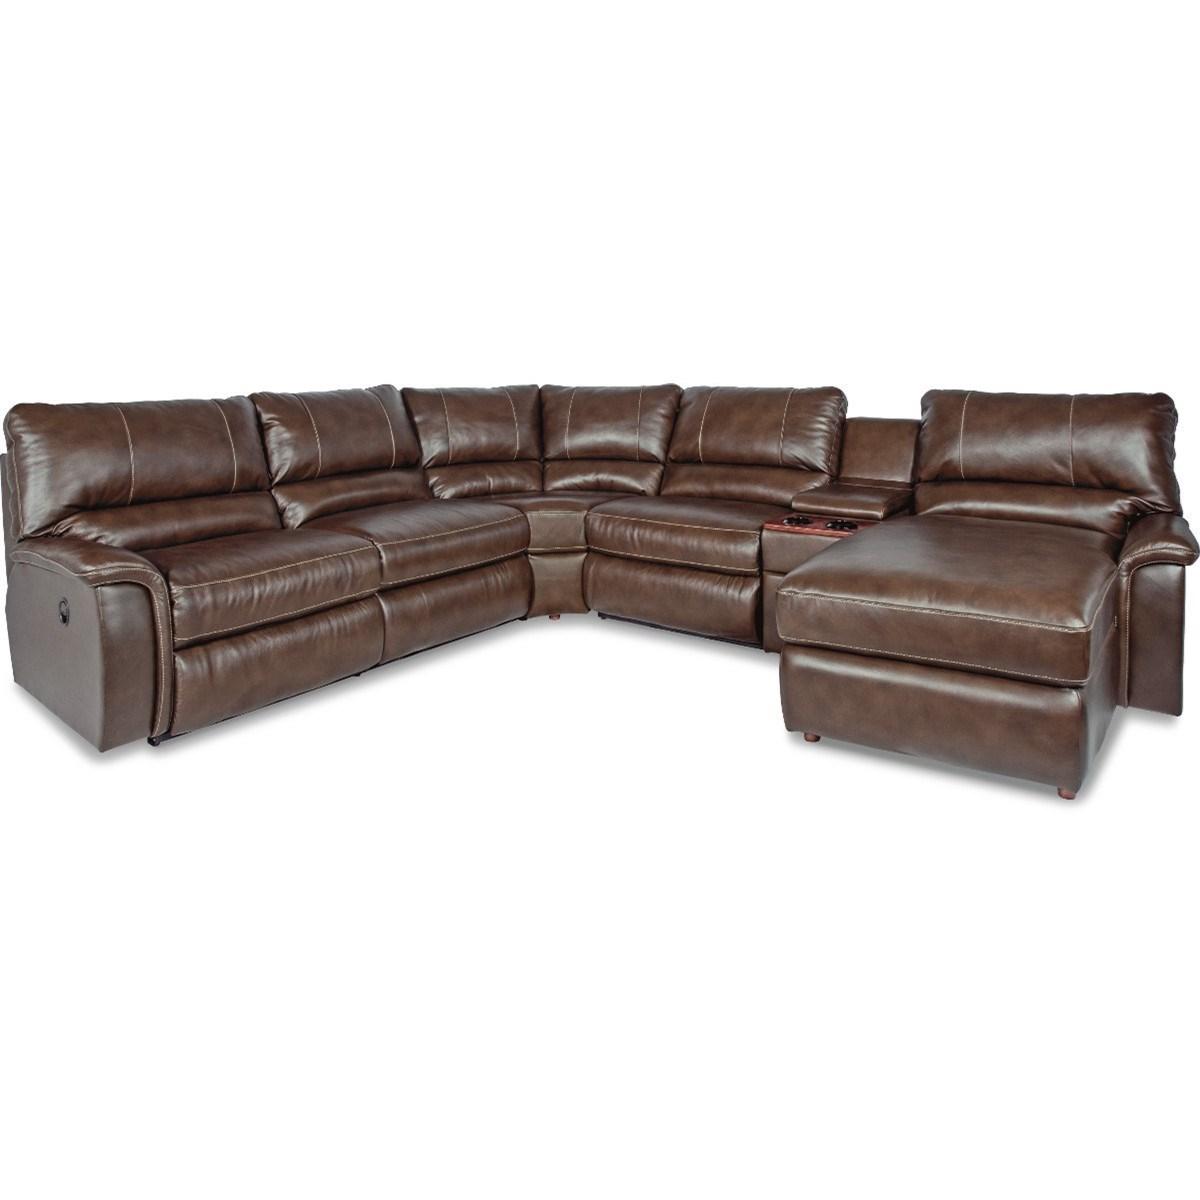 La Z Boy Aspen Six Piece Reclining Sectional Sofa With Right